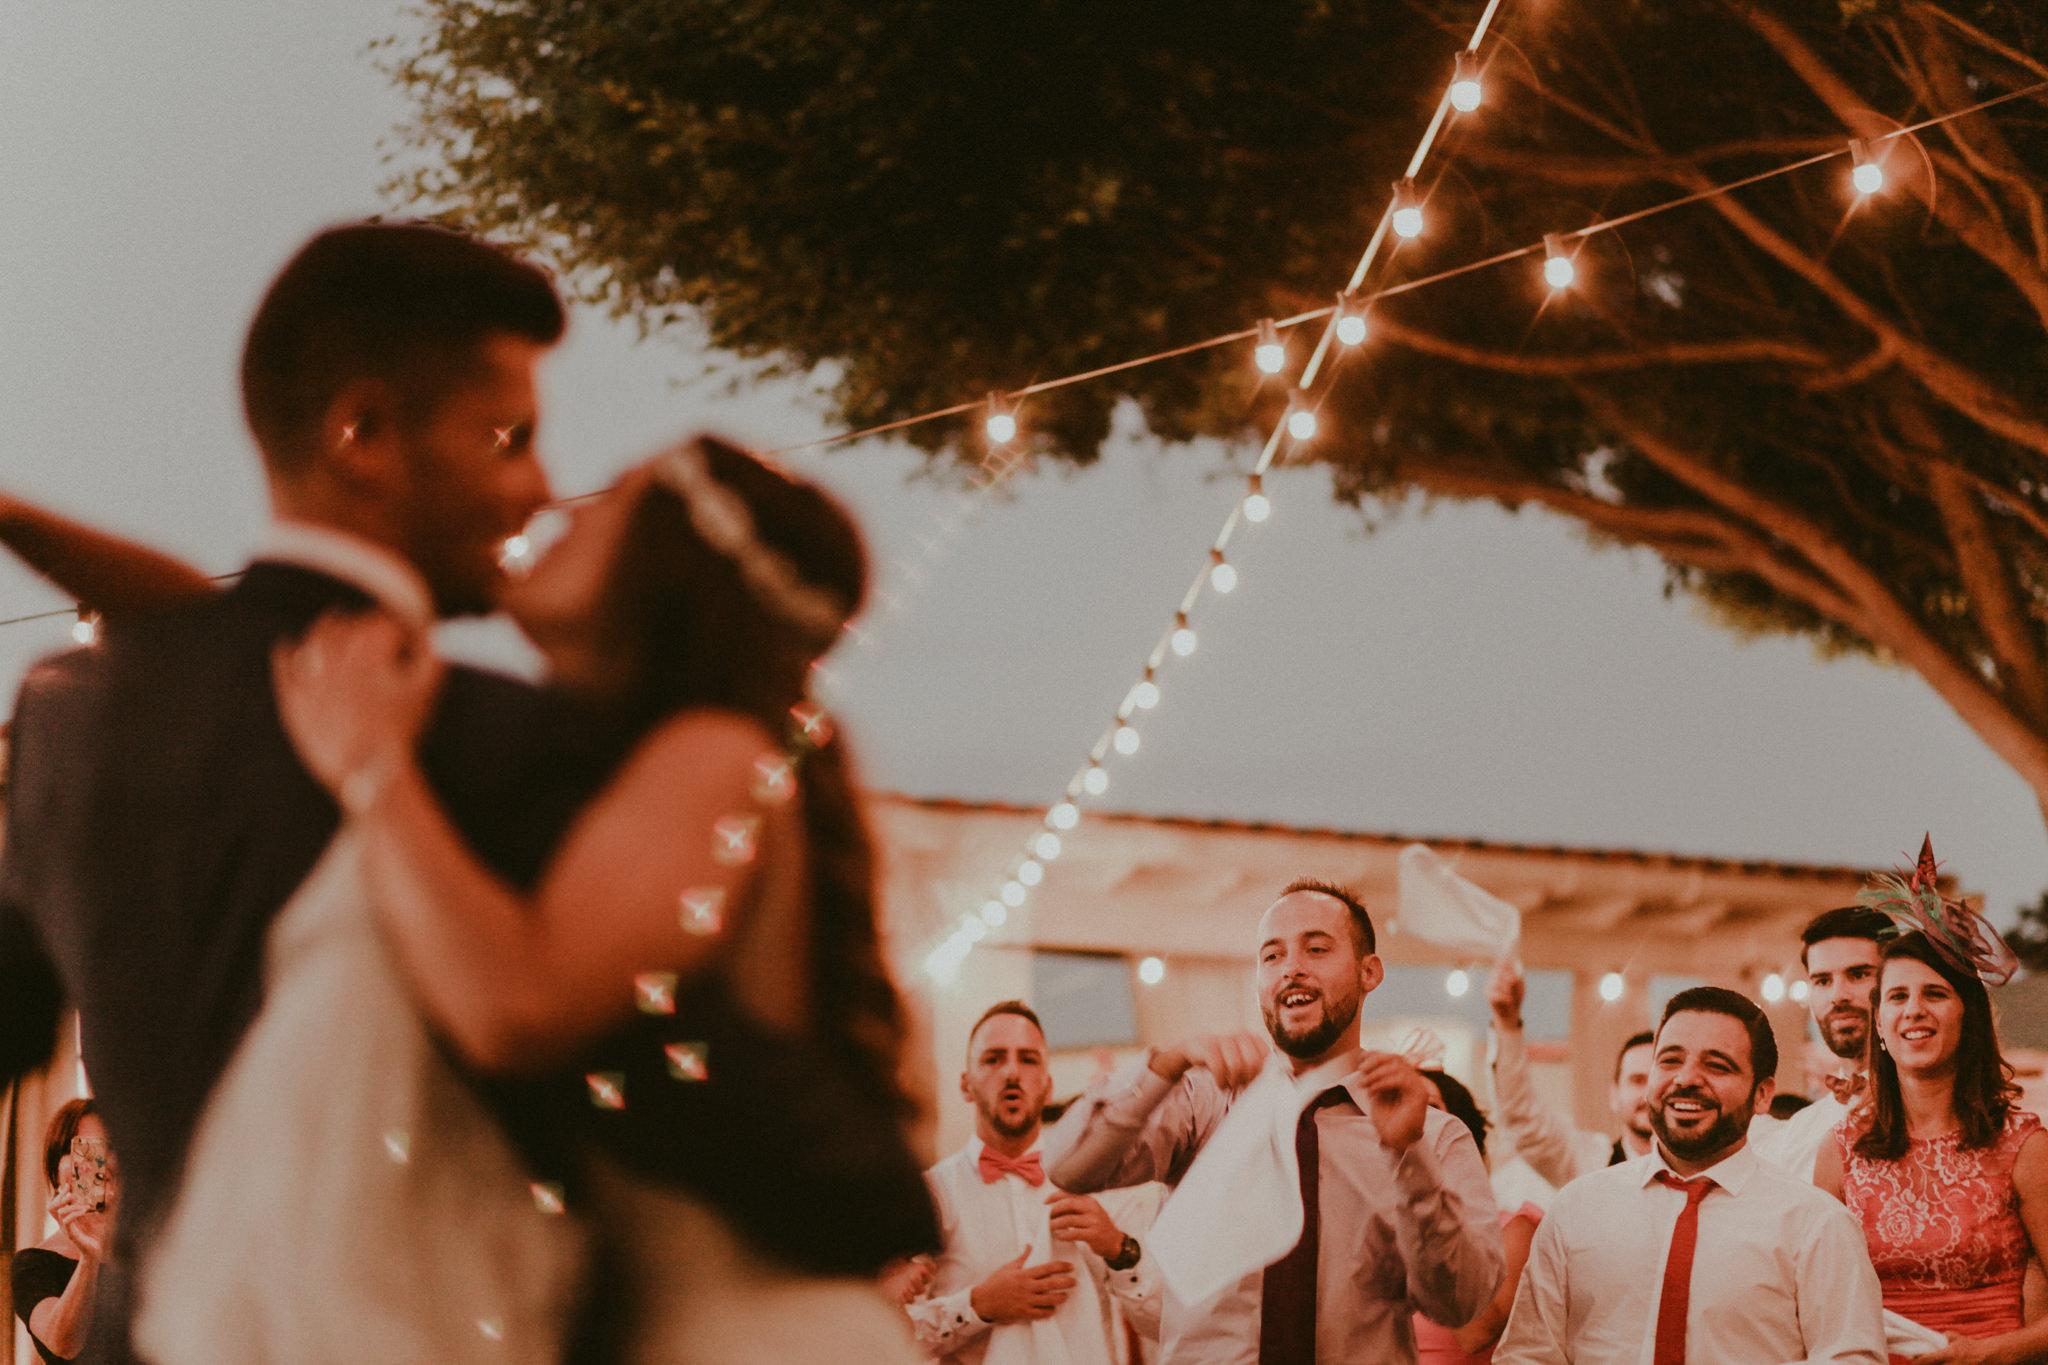 boda-diferente-fotografo-boda-laspalmas-grancanaria-73